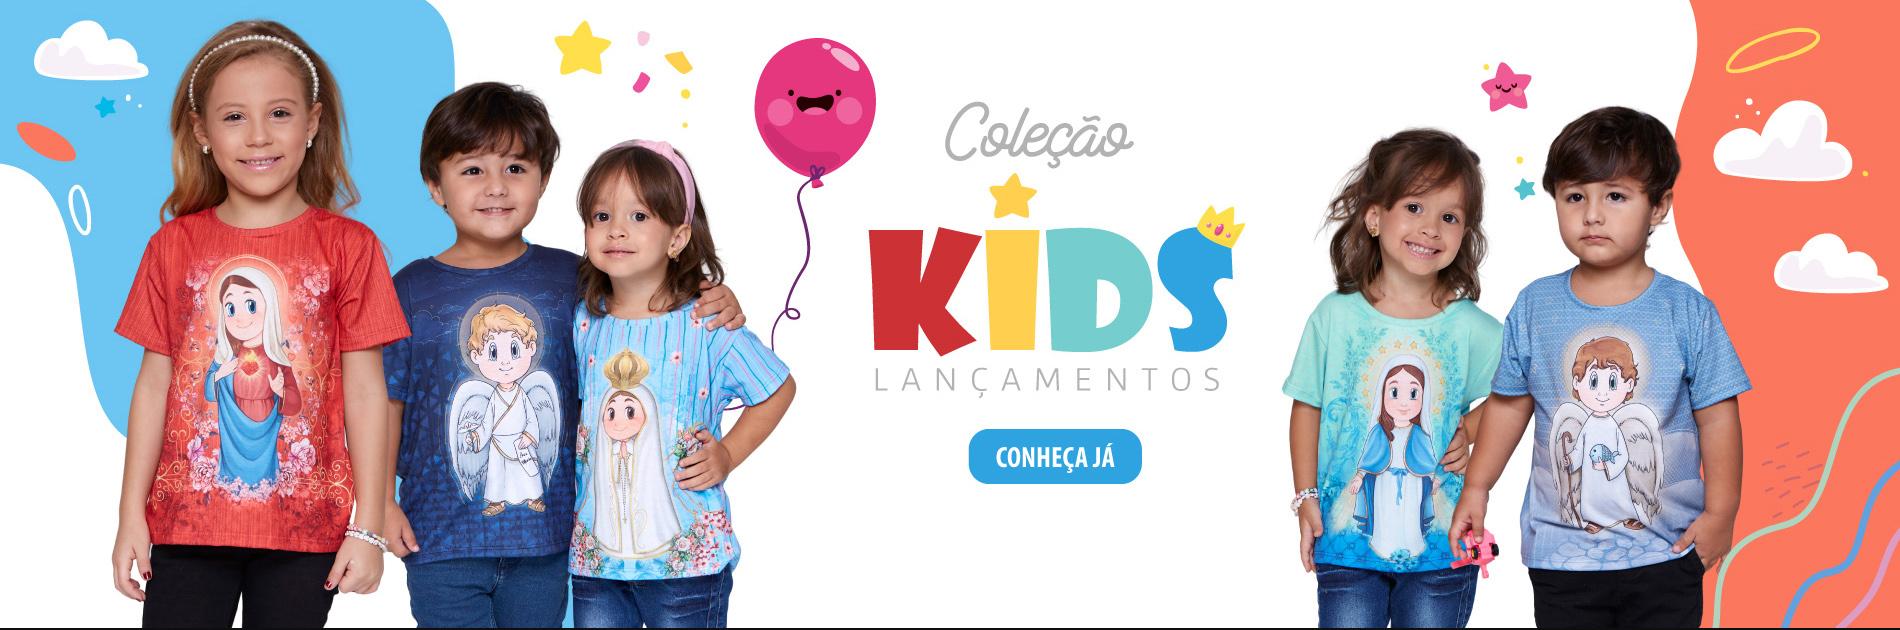 Kids Lançamento